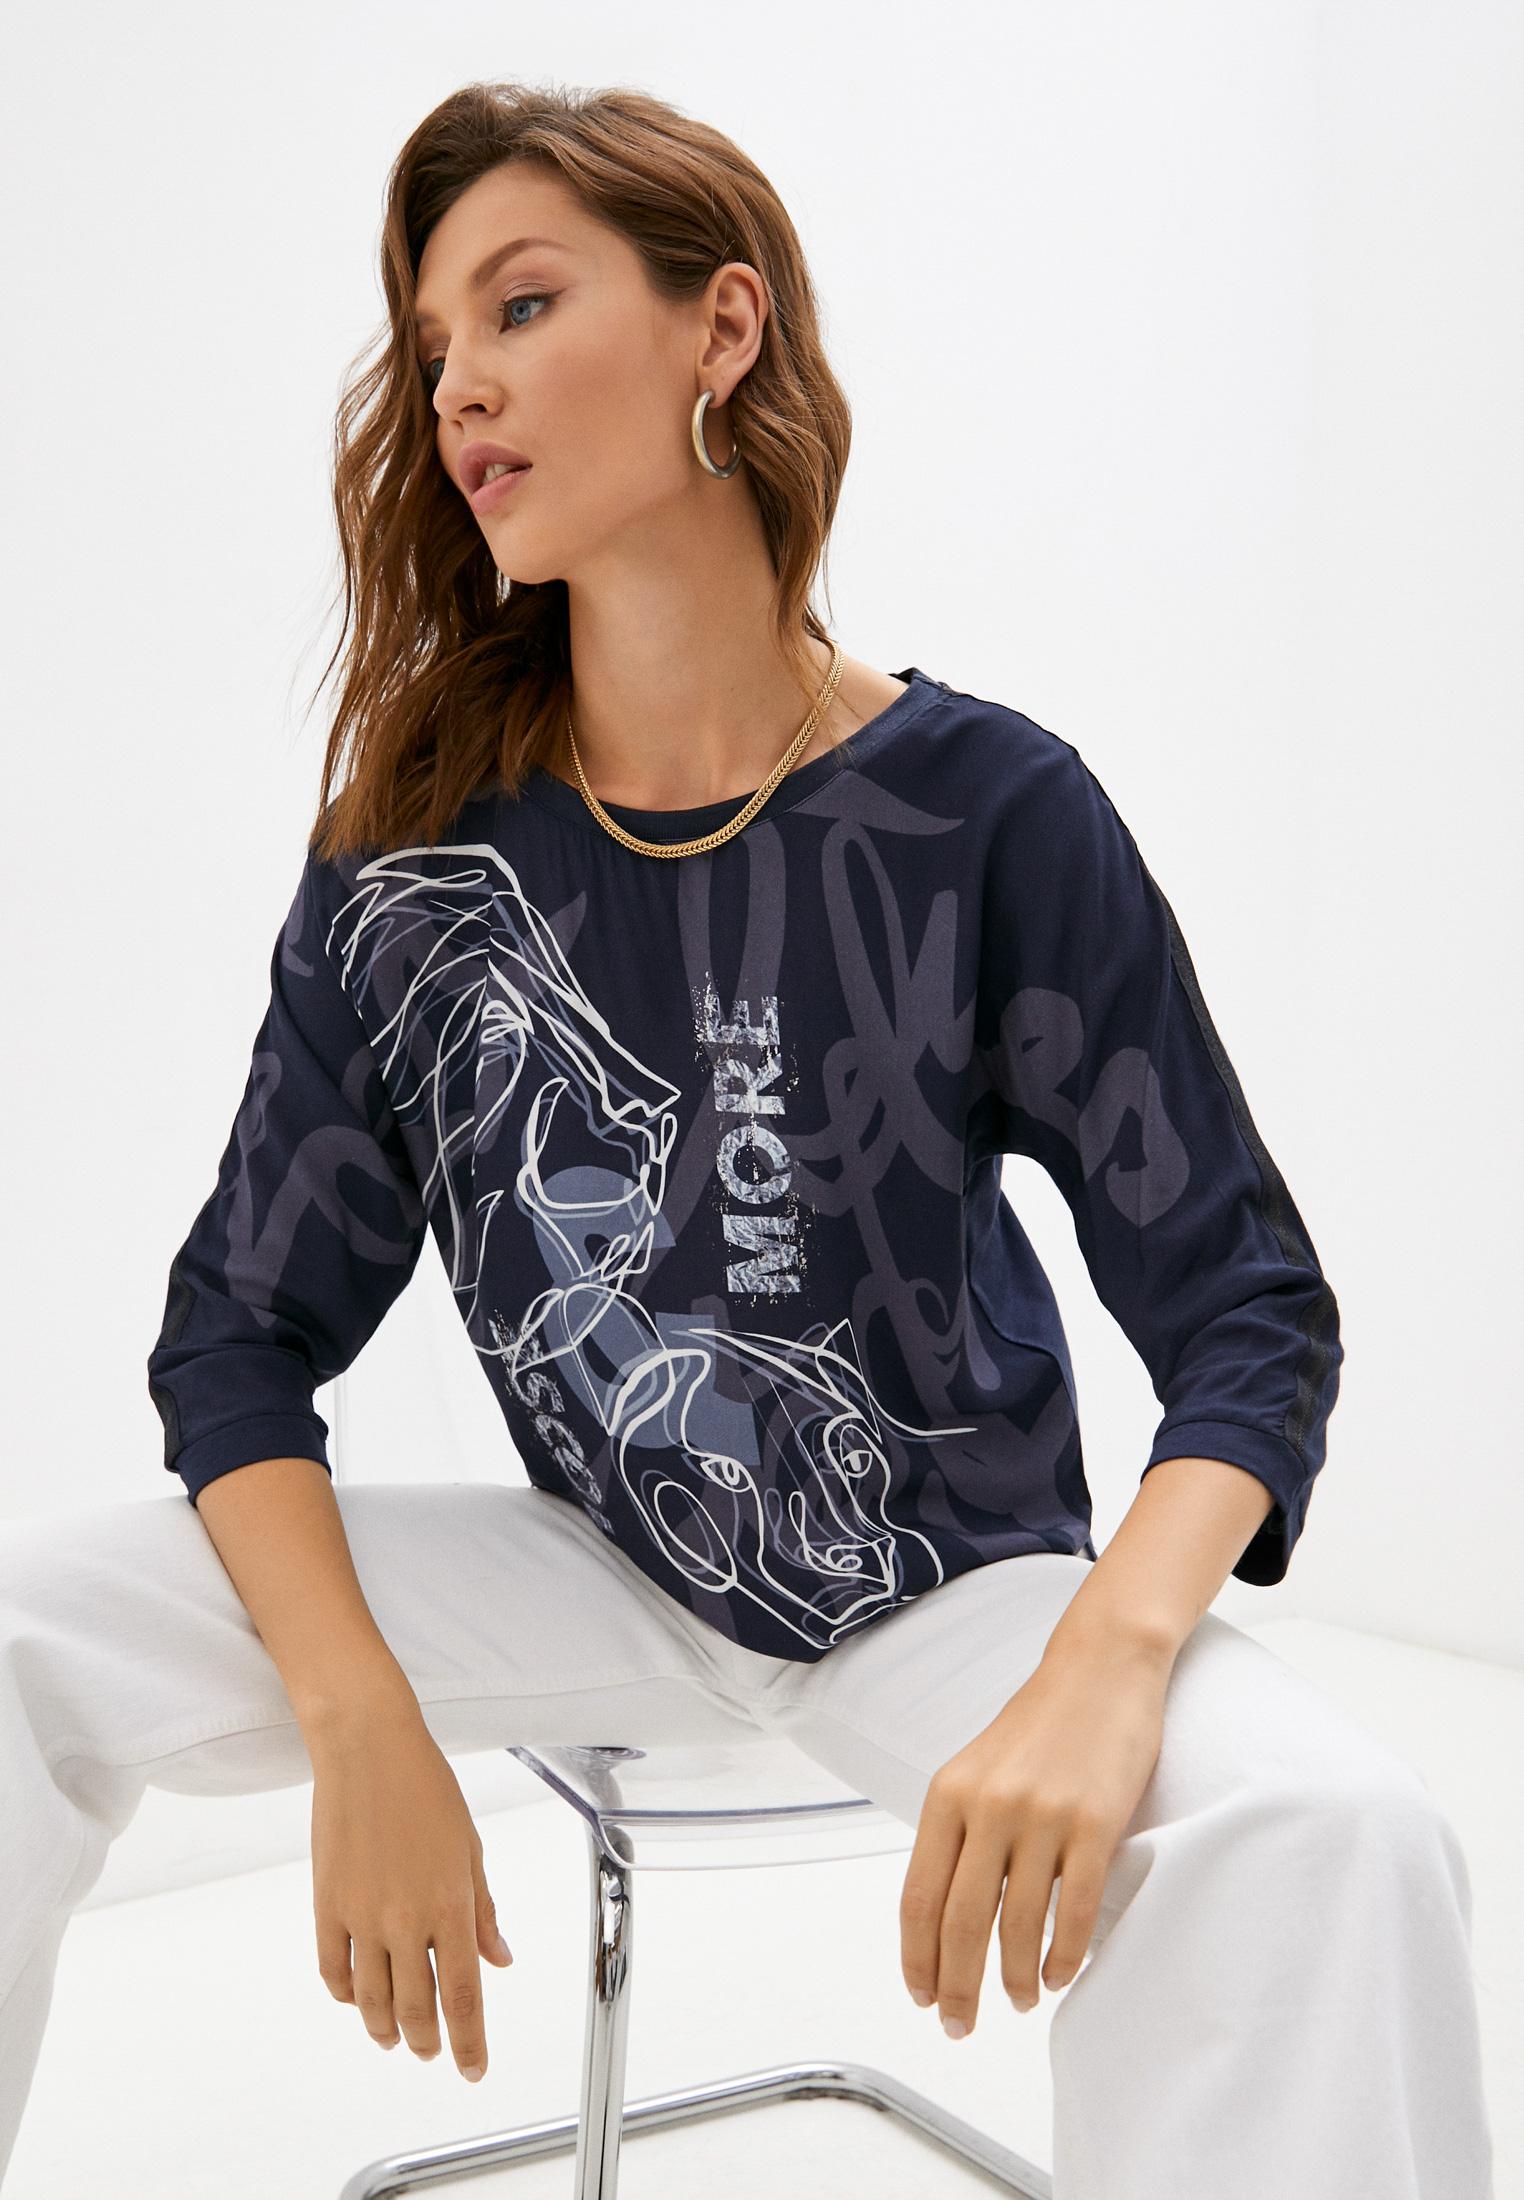 Блуза Betty & Co 2437/3219: изображение 1